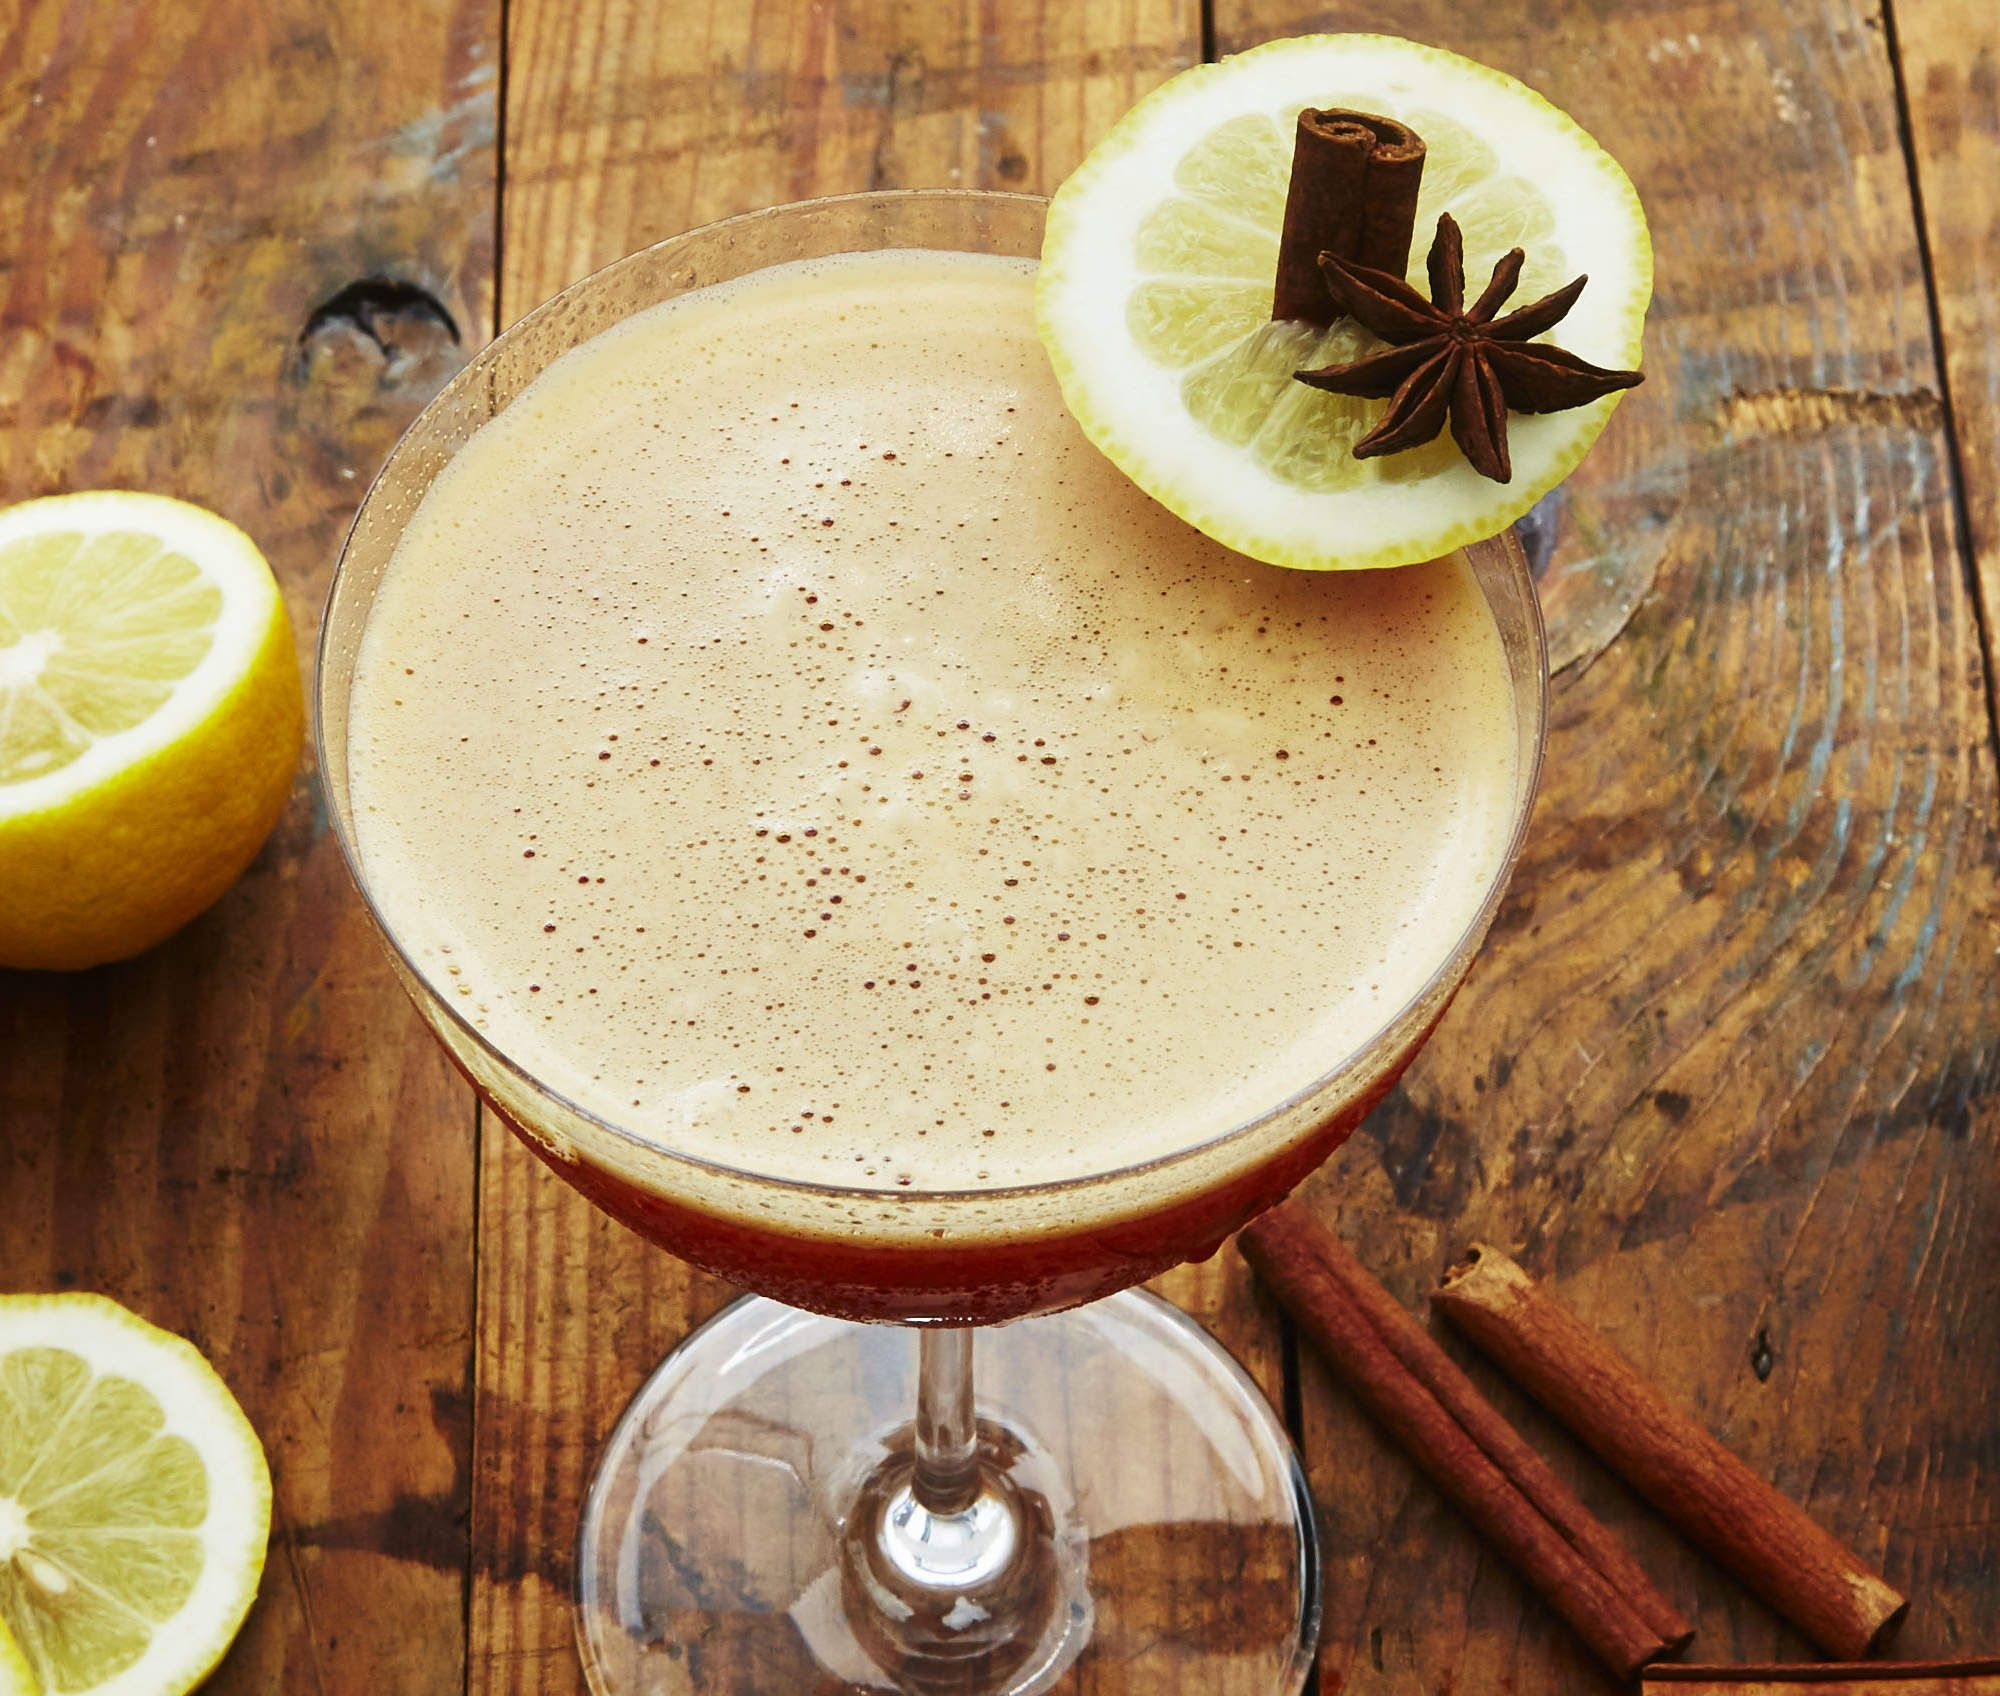 Pumpkin Martini, Martini Recipes, Pumpkin